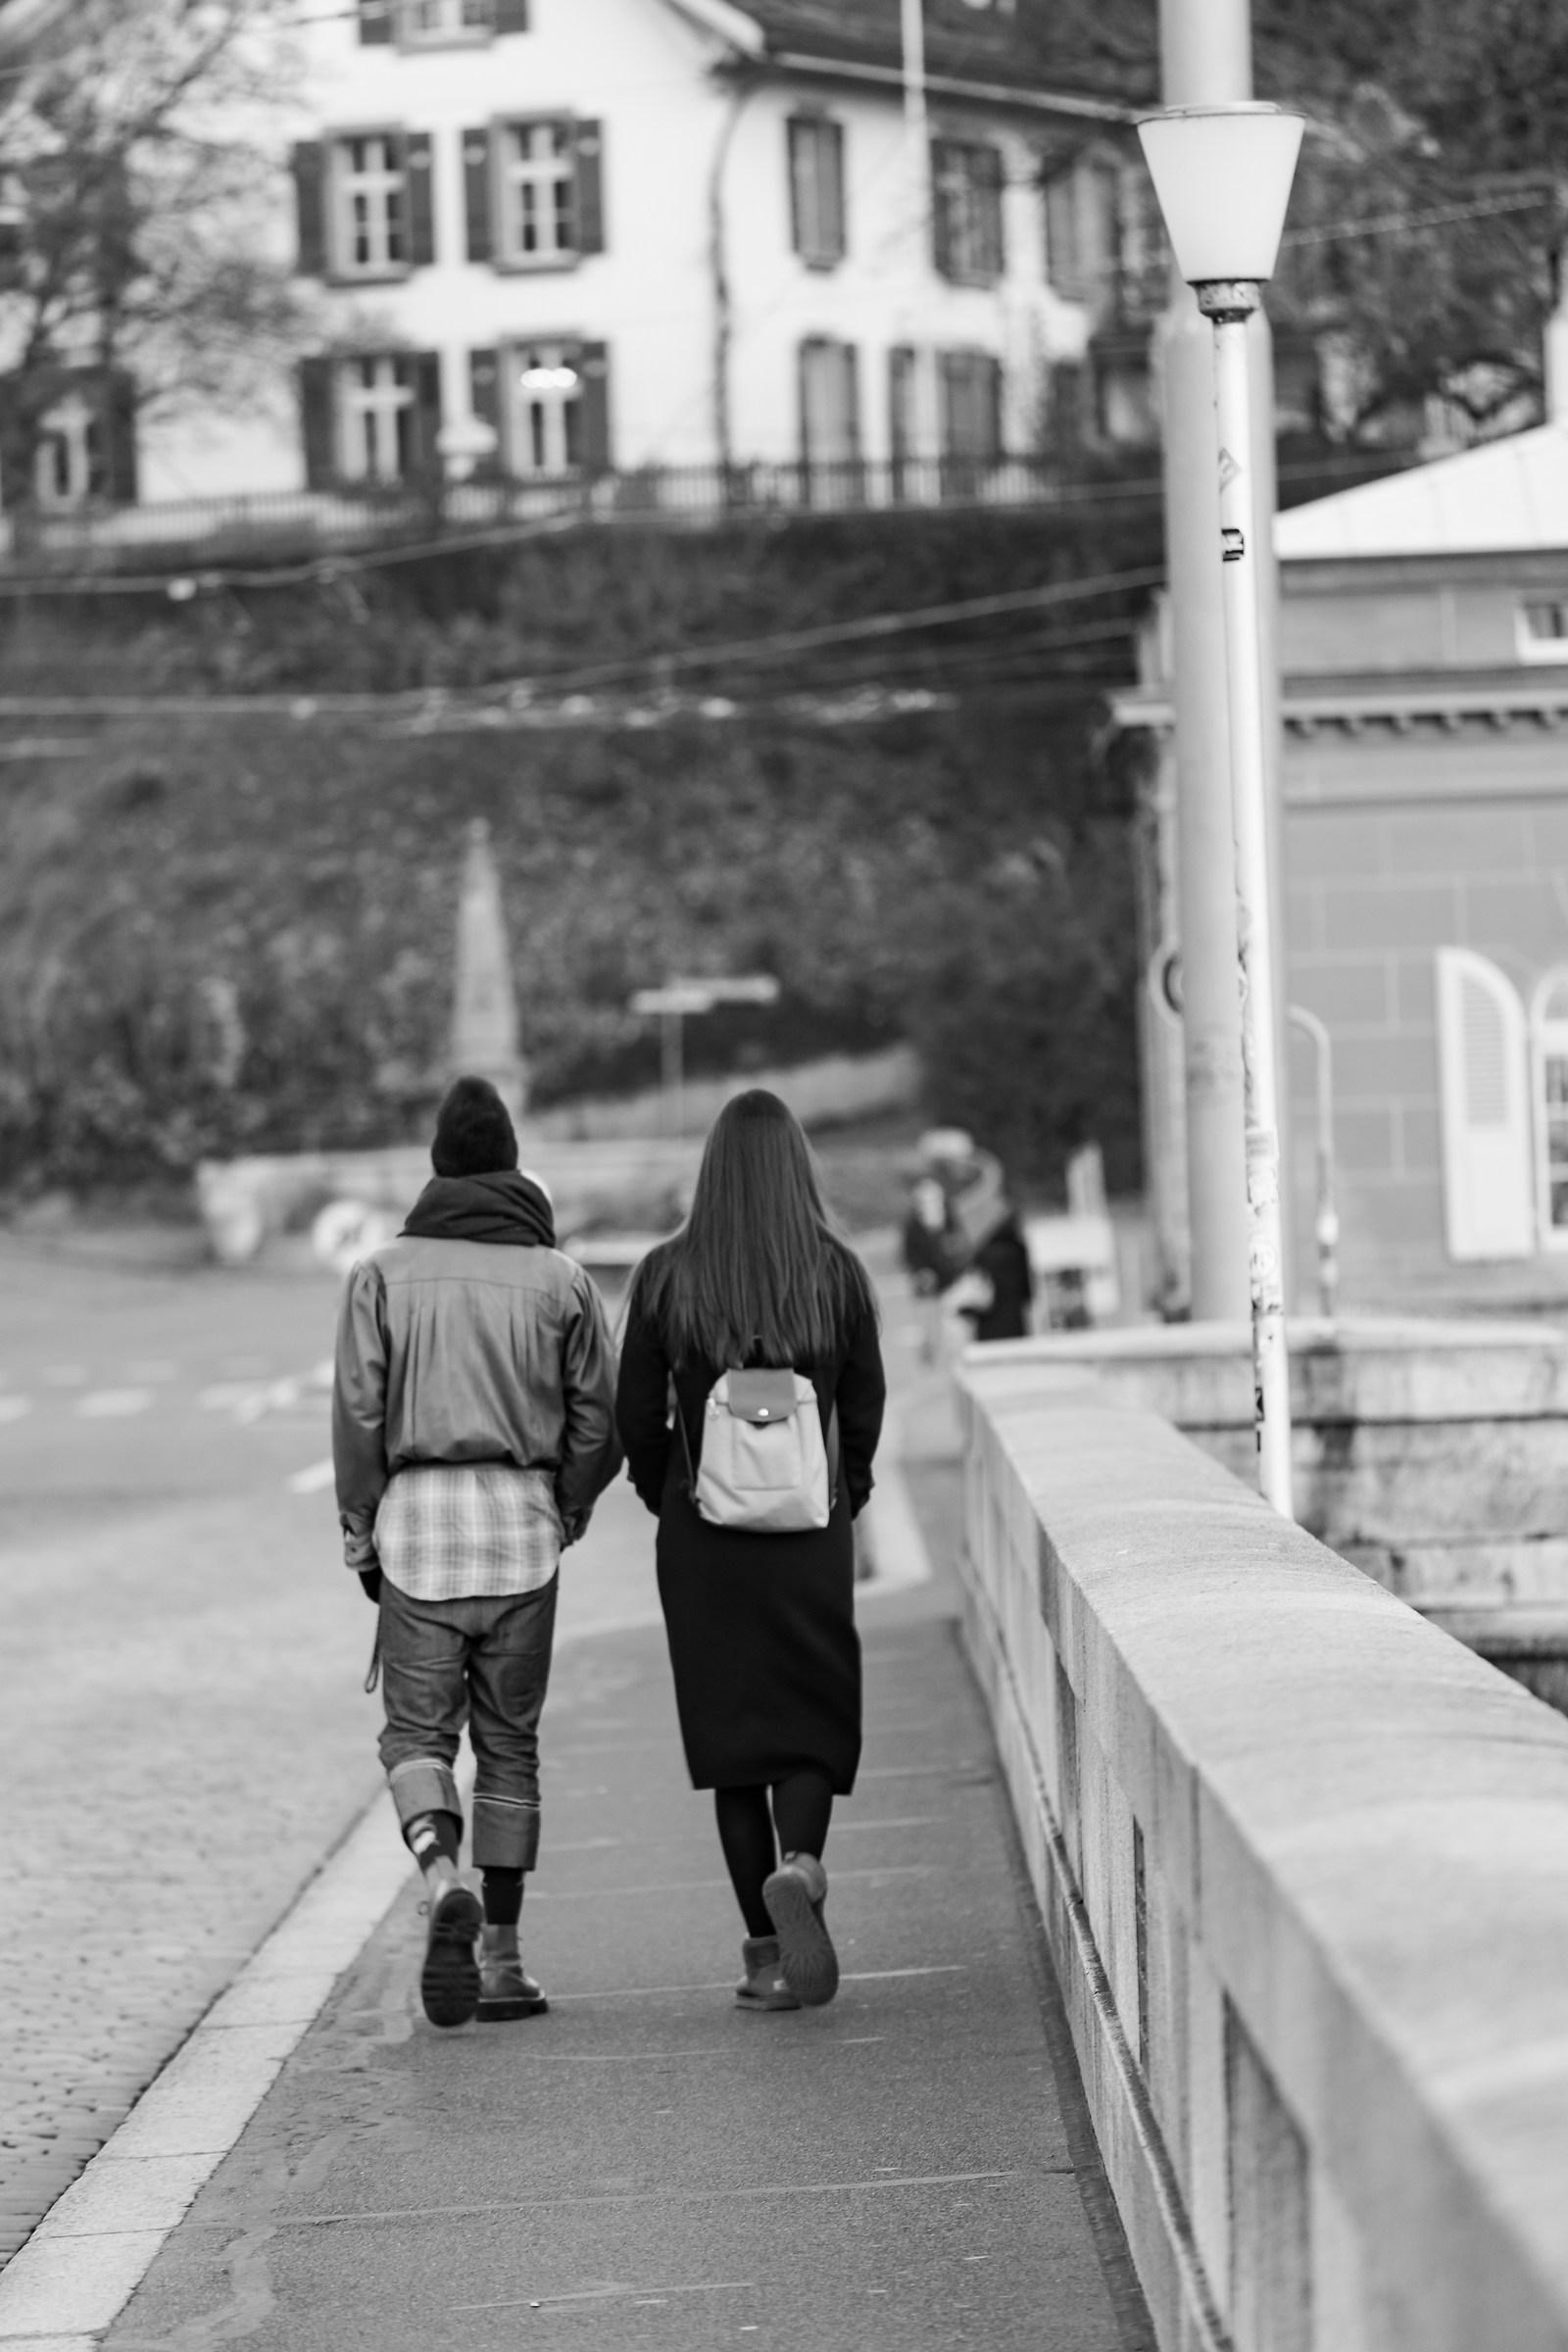 Walking around...